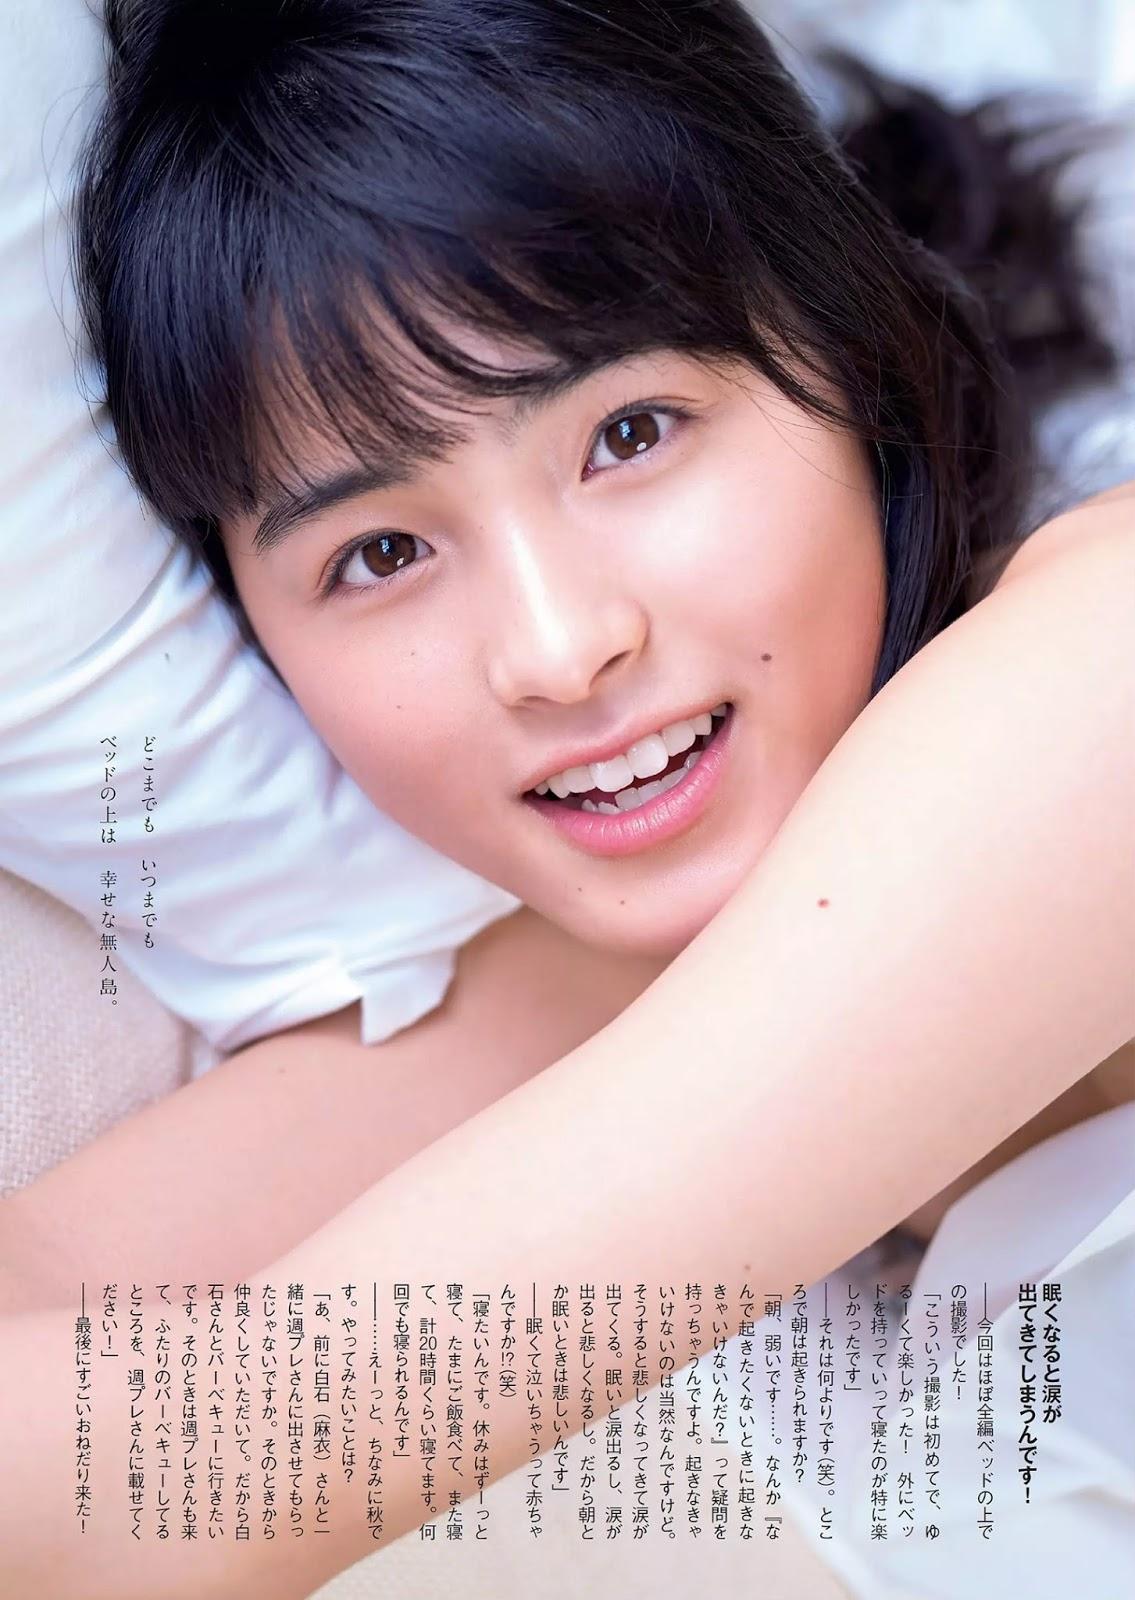 Ozono Momoko 大園桃子, Weekly Playboy 2017 No.43 (週刊プレイボーイ 2017年43号)